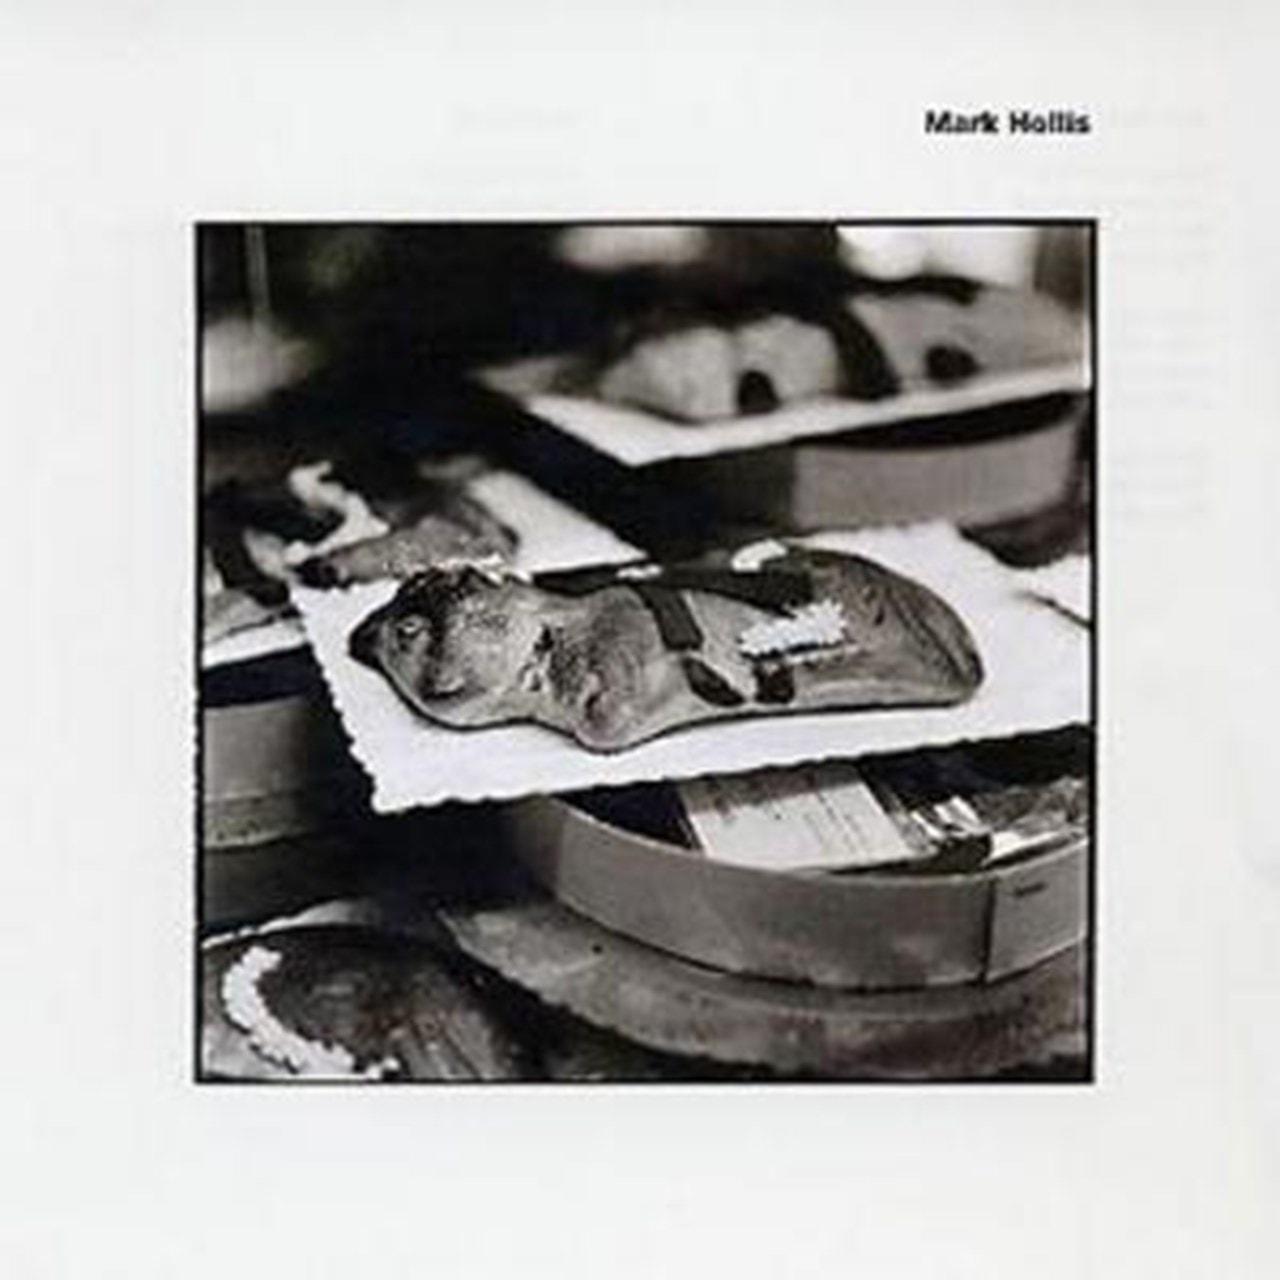 Mark Hollis - 1